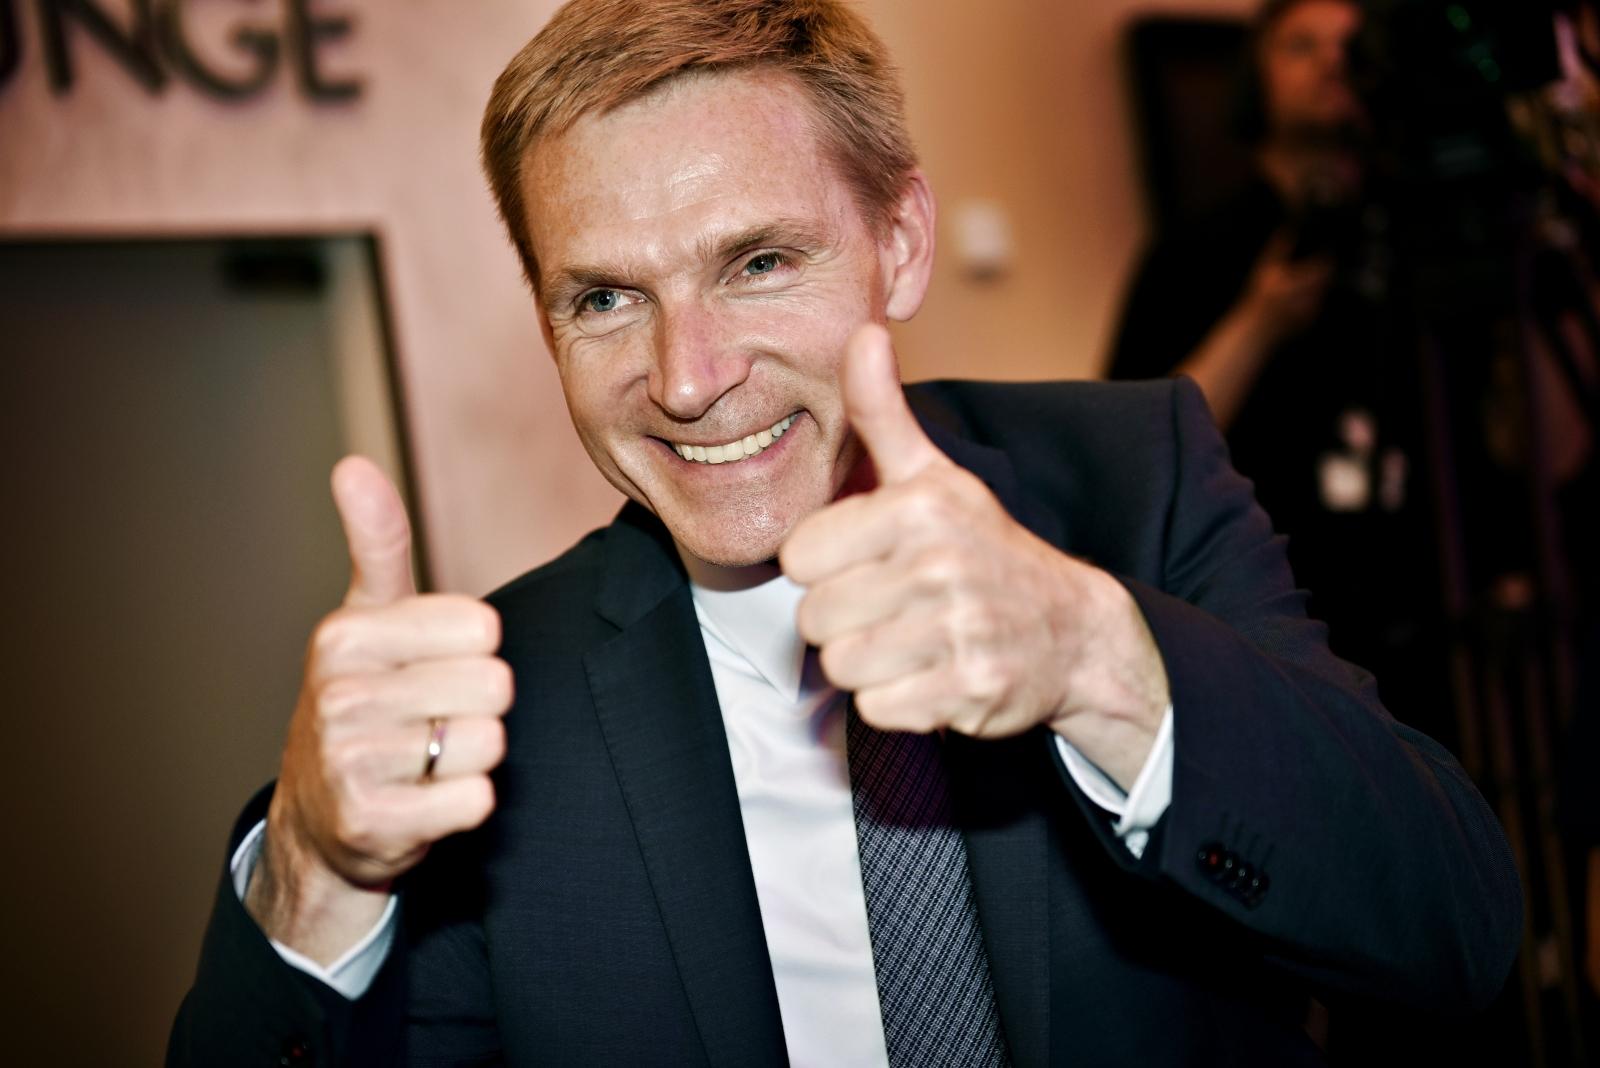 Danish politician Kristian Thulesen Dahl